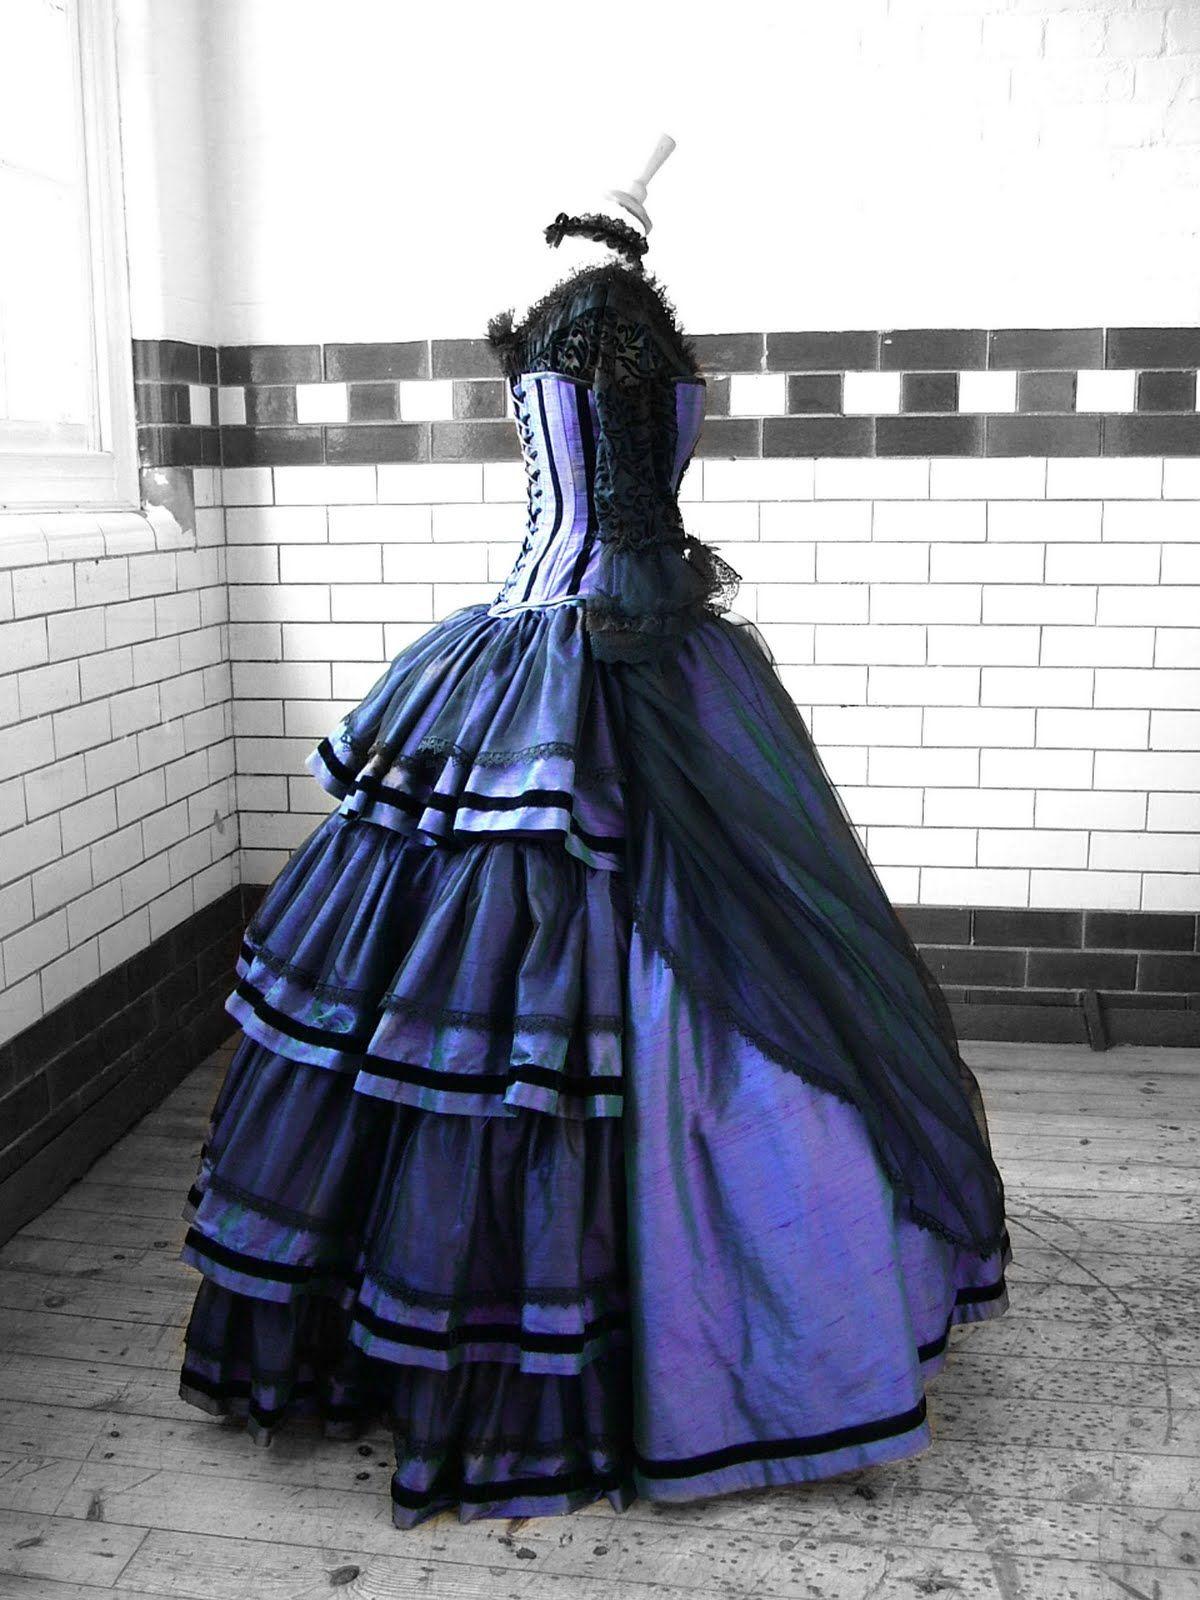 Something Steampunk Dress Steampunk Prom Dress Steampunk Wedding Dress [ 1600 x 1200 Pixel ]